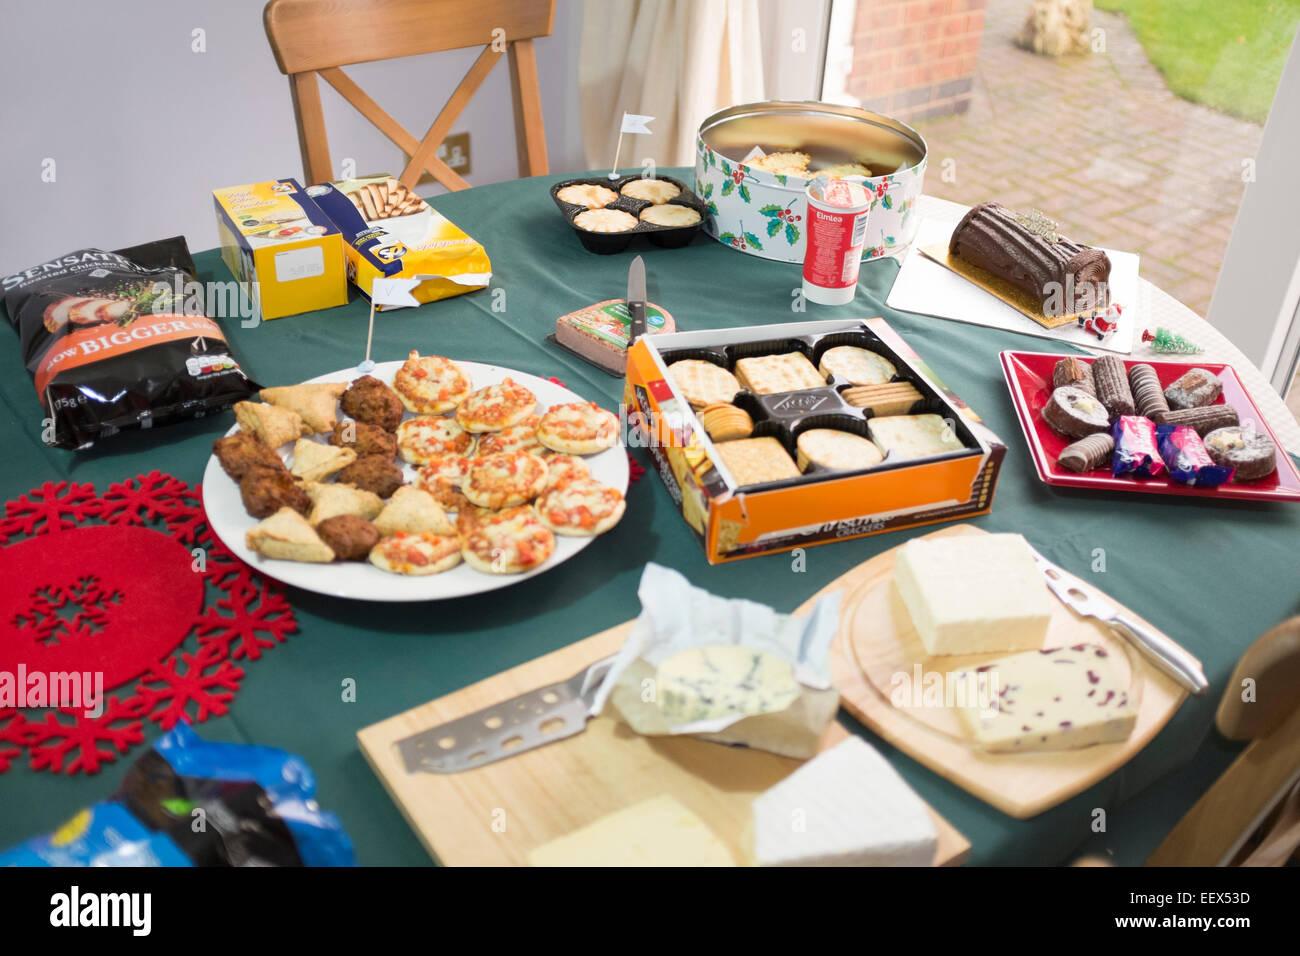 Christmas Buffet Table Lunch Gluten Free Coeliac Stock